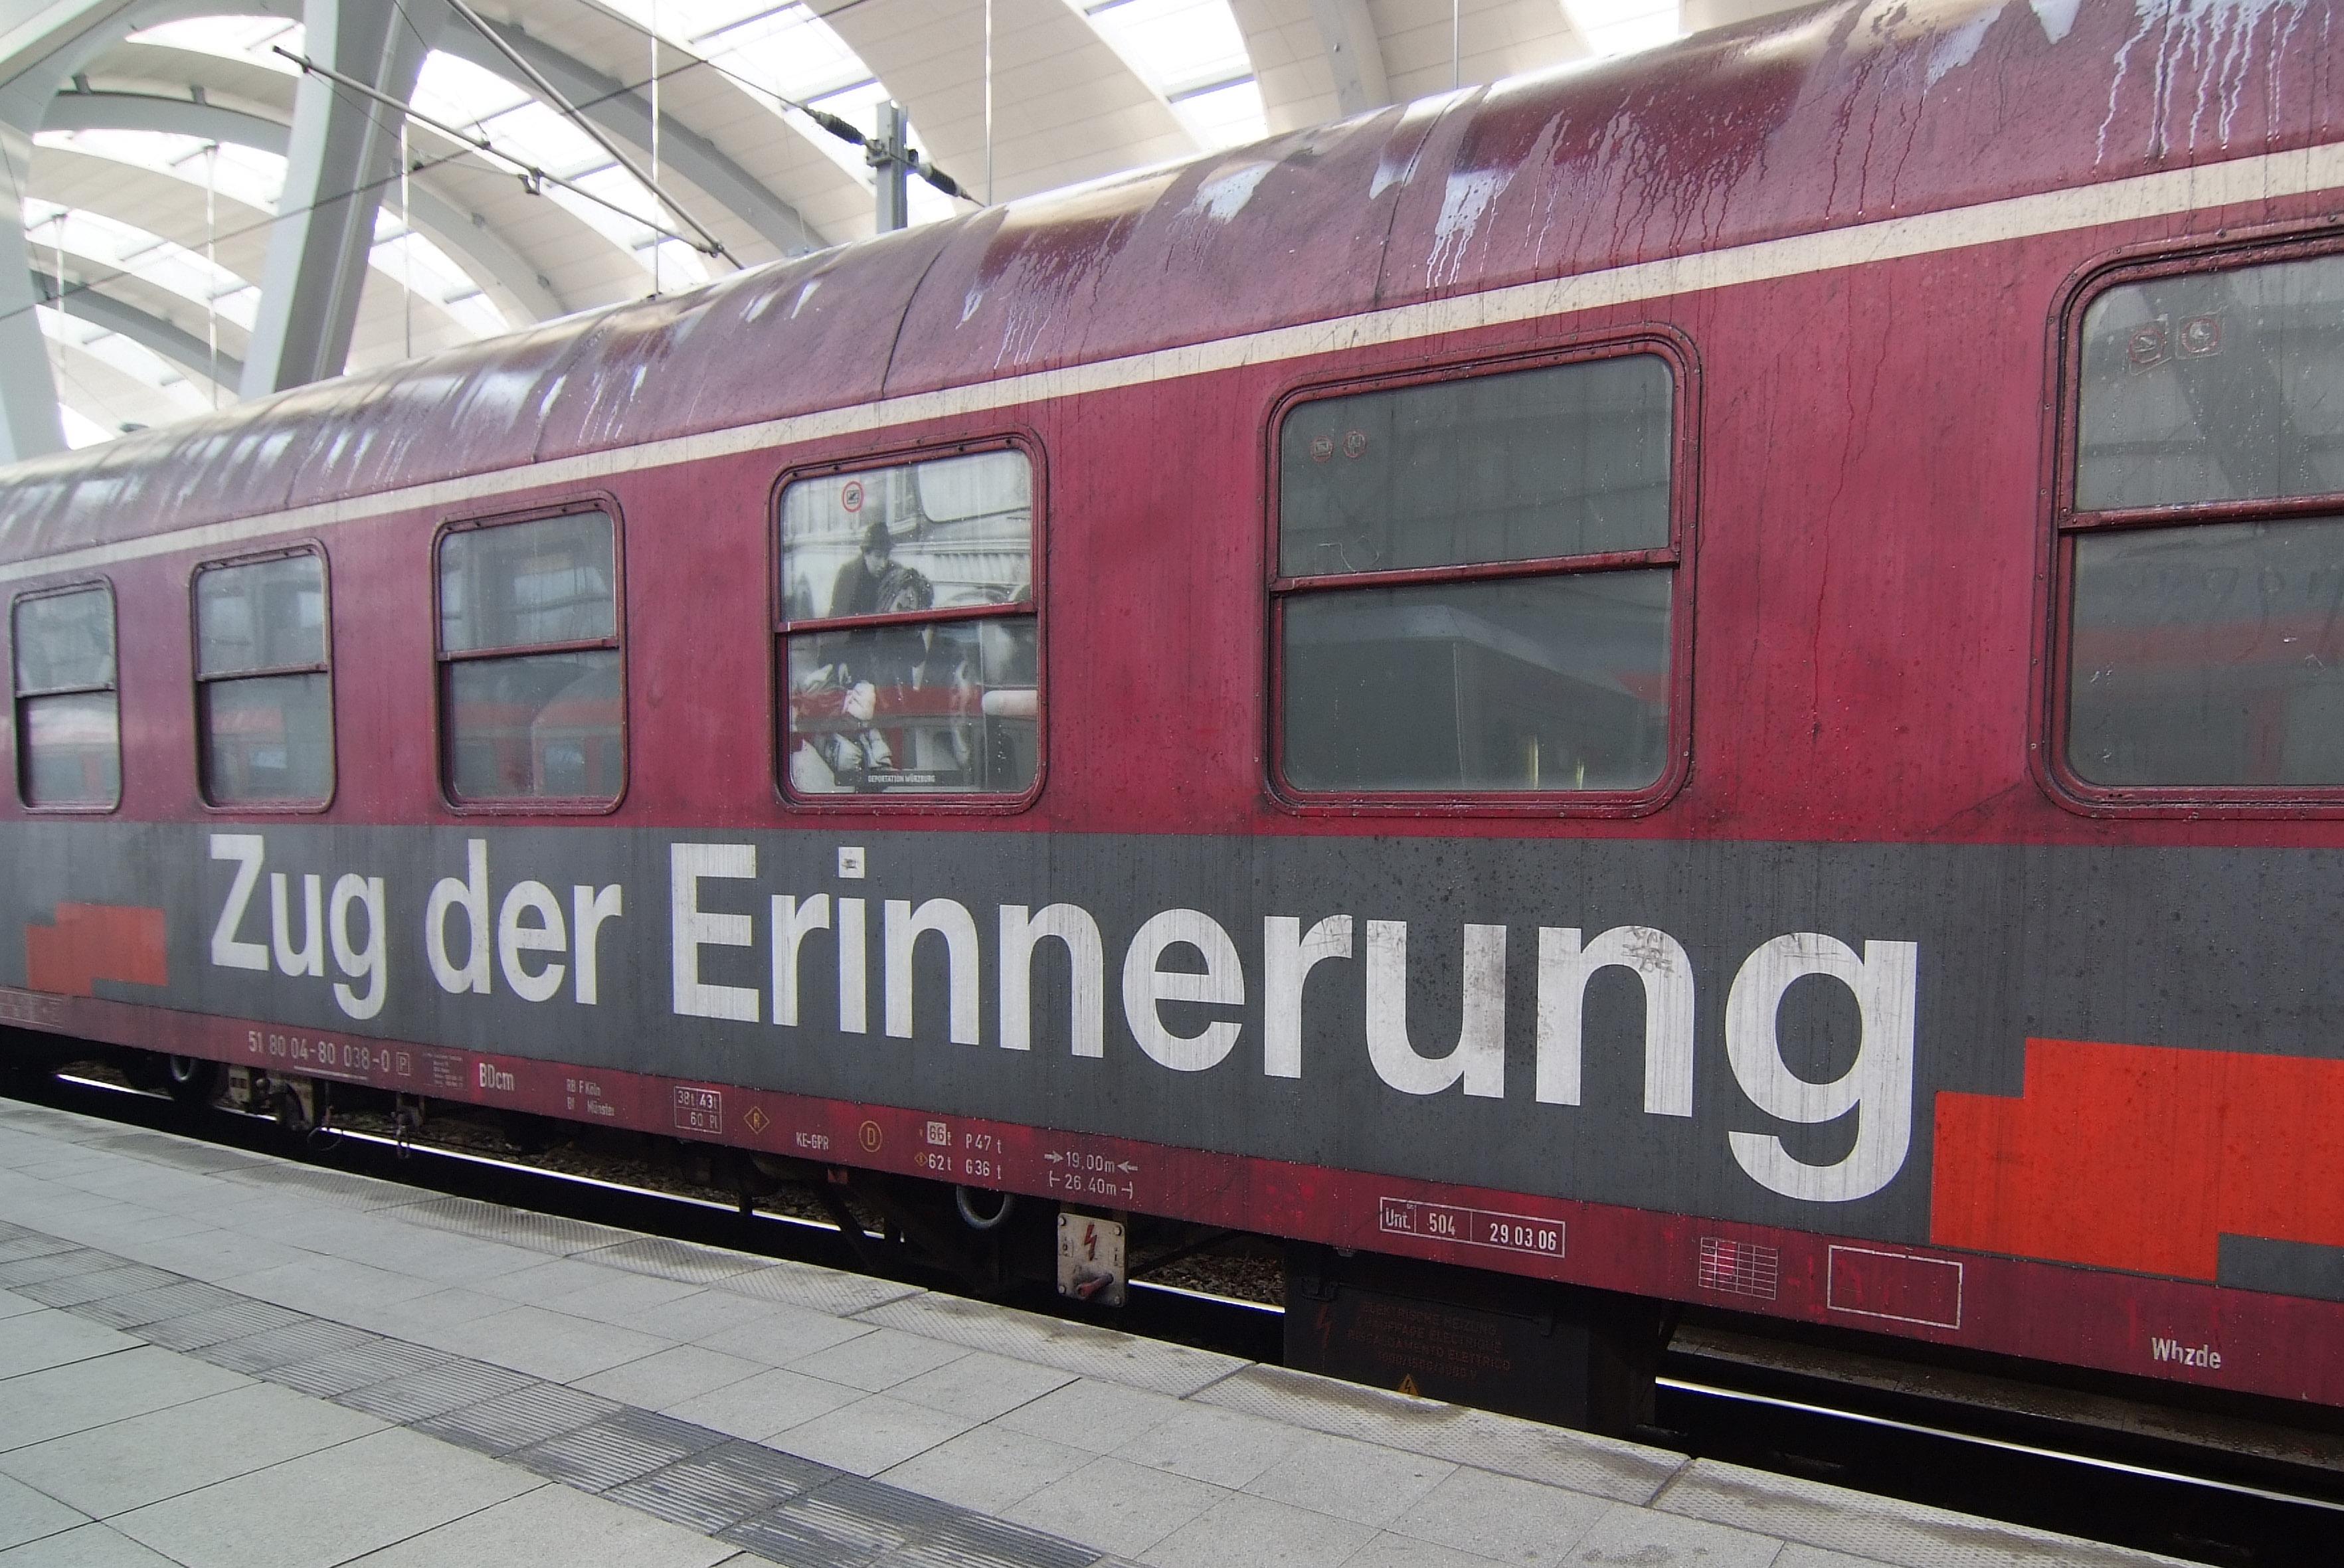 https://upload.wikimedia.org/wikipedia/commons/2/24/Zug_der_Erinnerung_20080407-DSCF0388.jpg